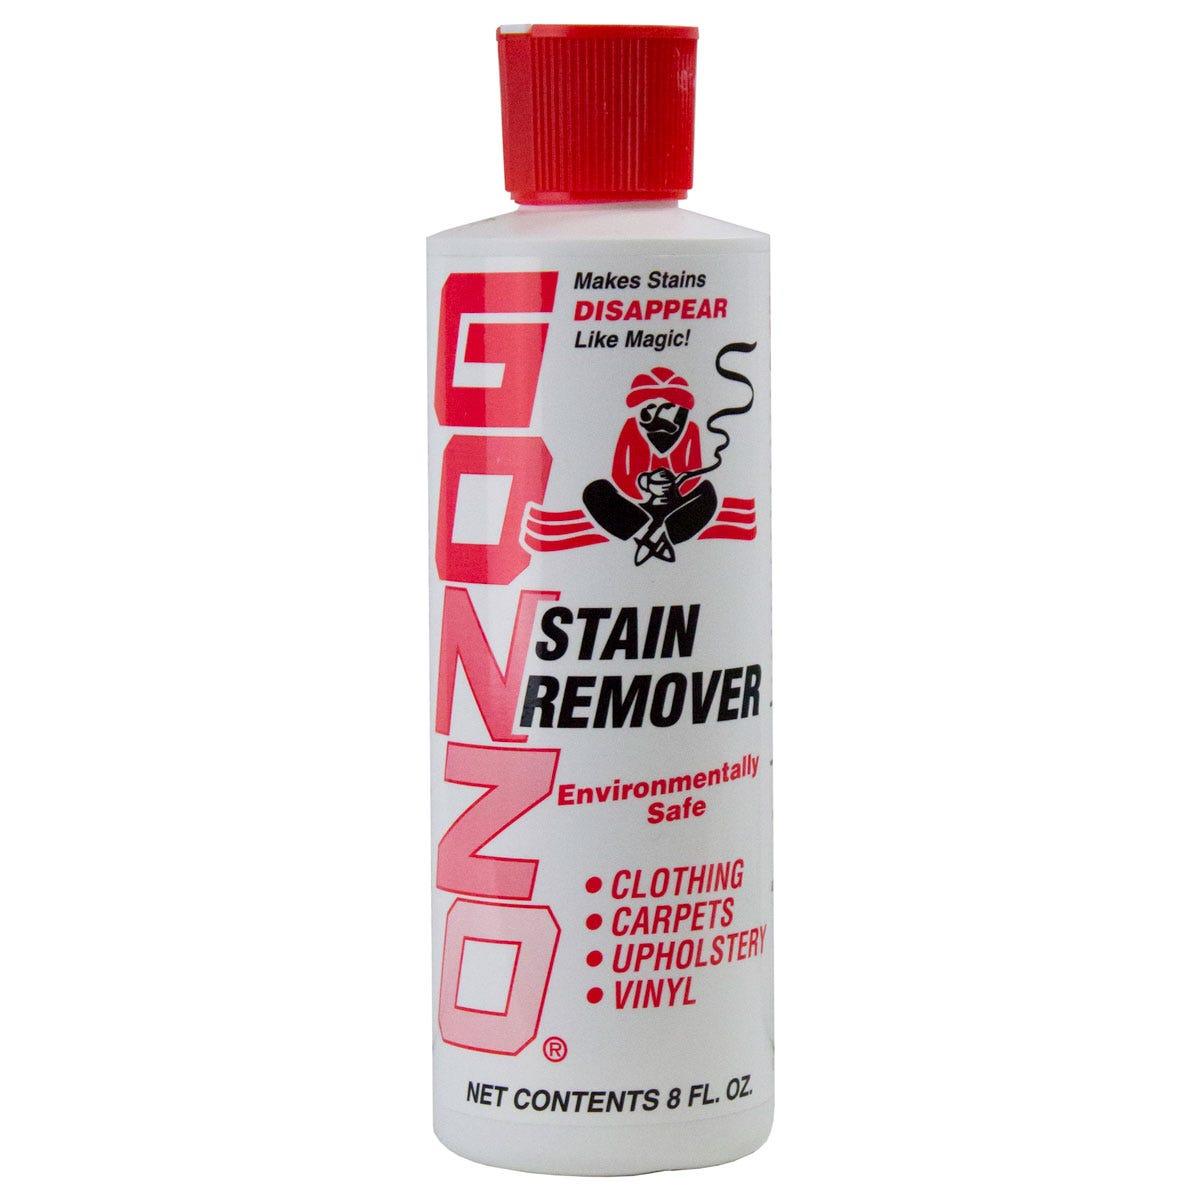 https://googone.com/media/catalog/product/g/o/gonzo-stain-remover_front.jpg